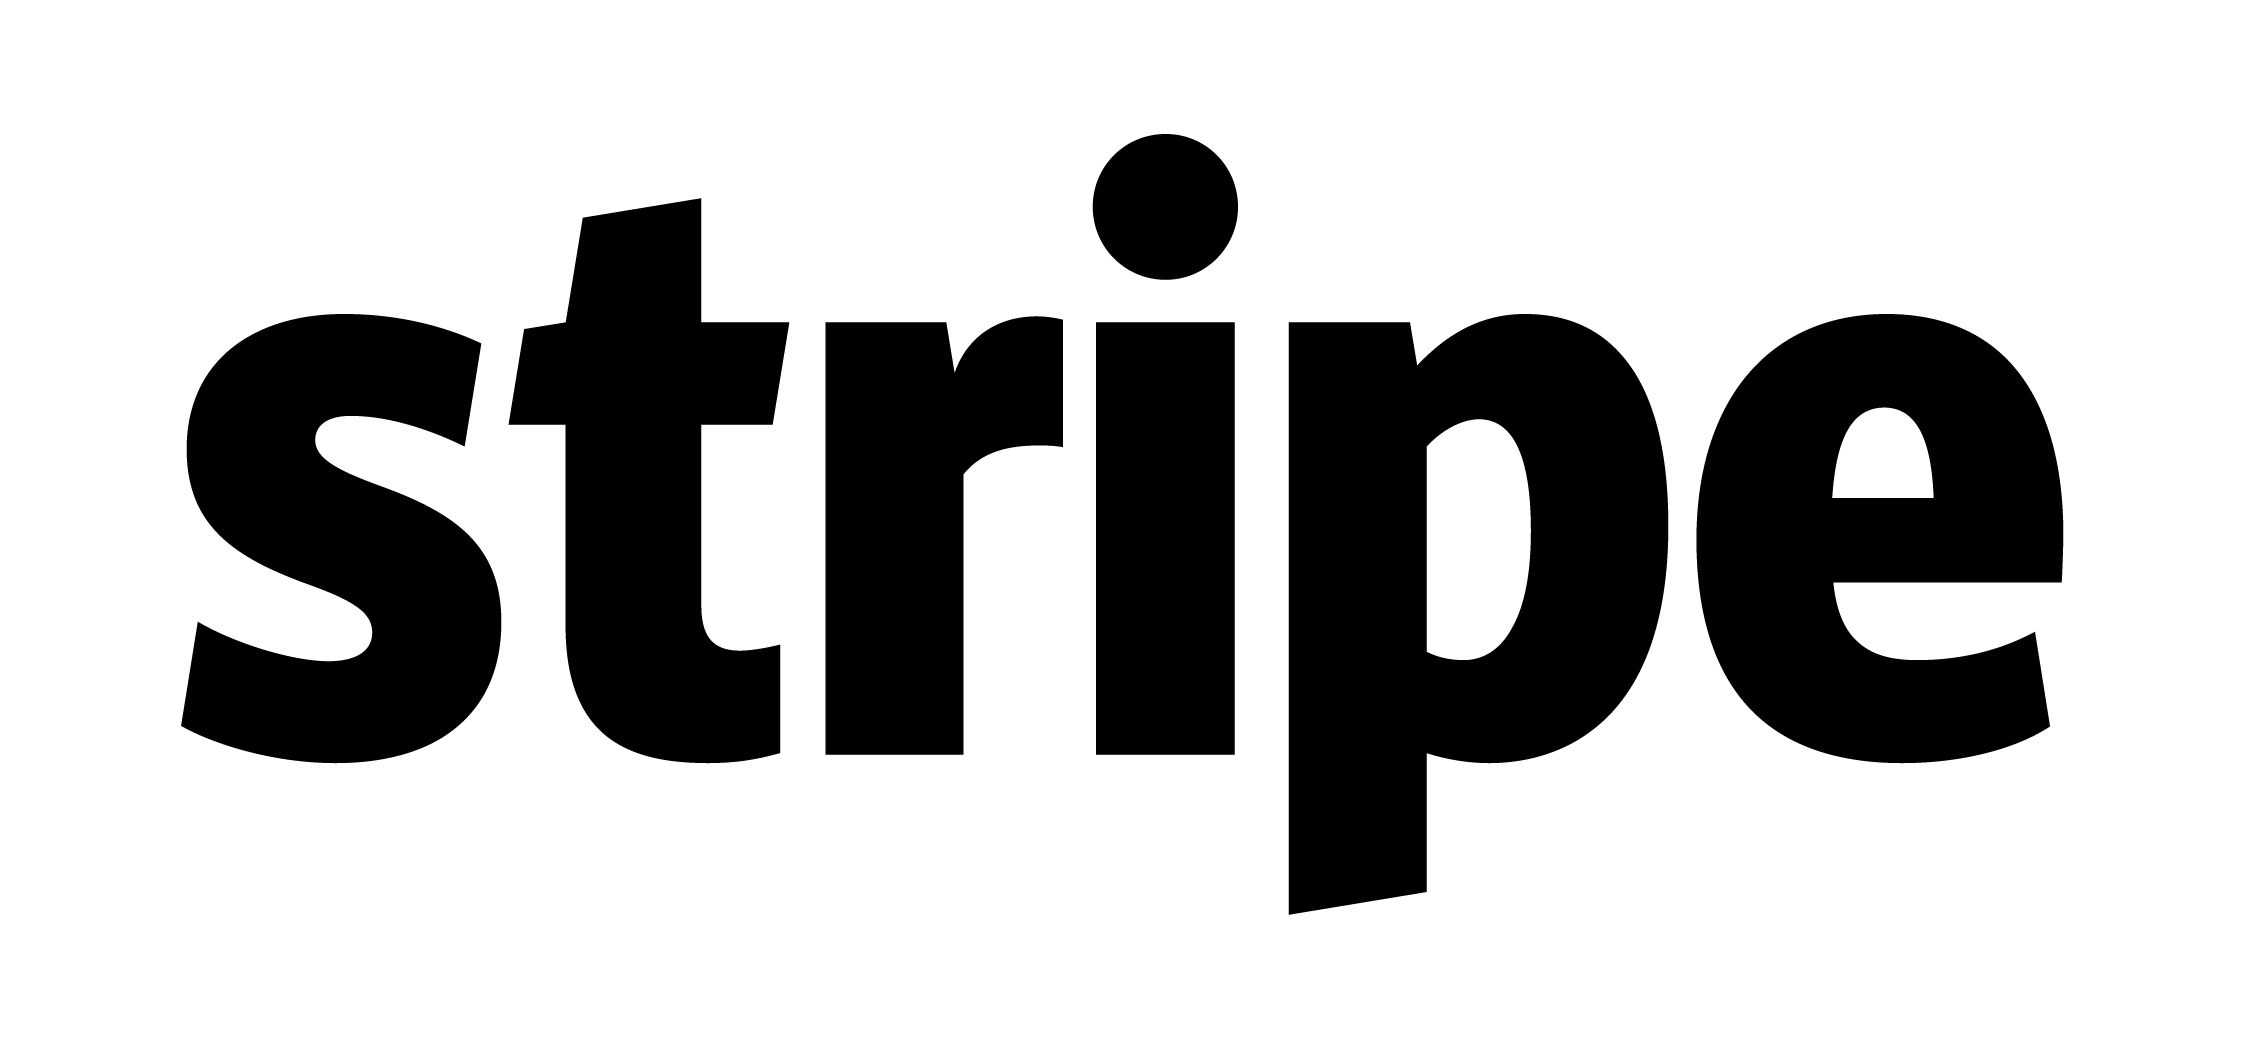 stripe logo – The European Sting - Critical News & Insights on European  Politics, Economy, Foreign Affairs, Business & Technology -  europeansting.com